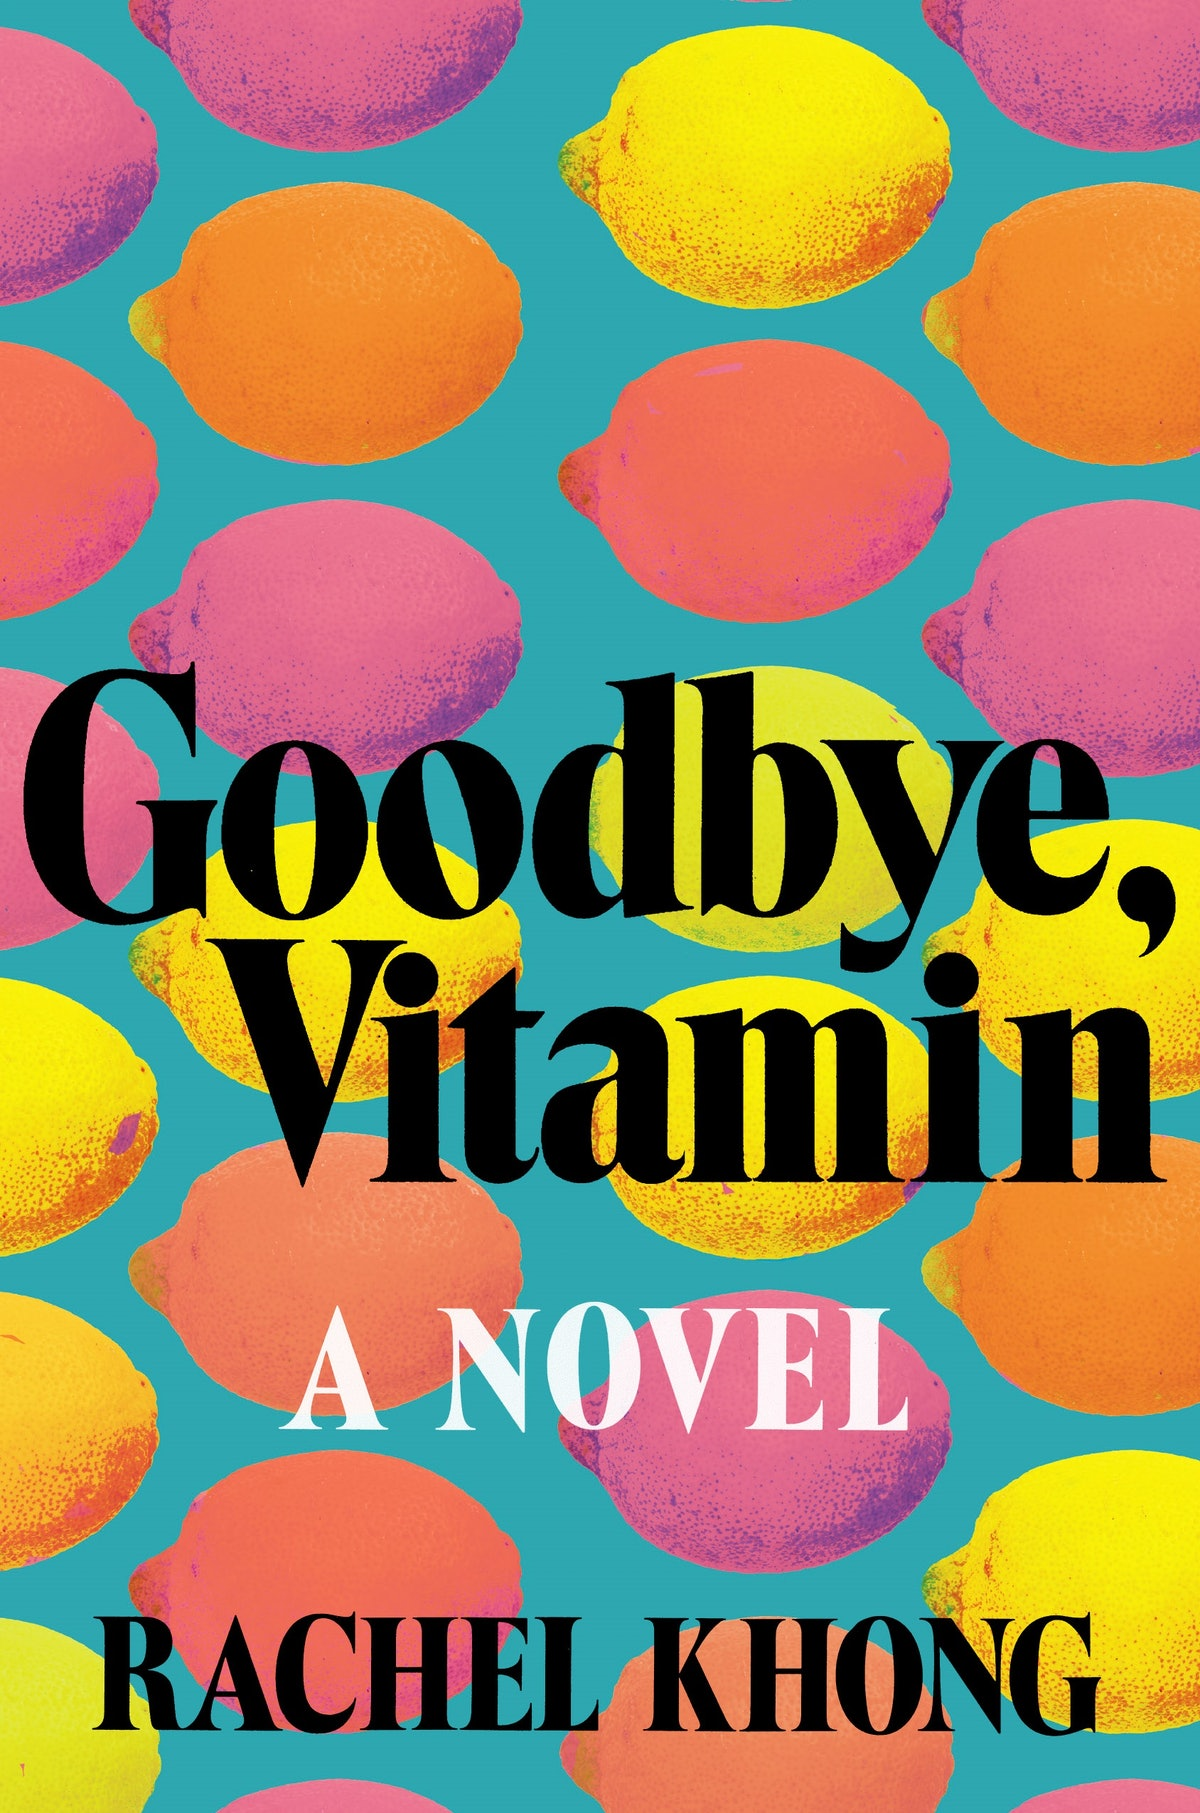 Goodbye_Vitamin_APPROVED.indd